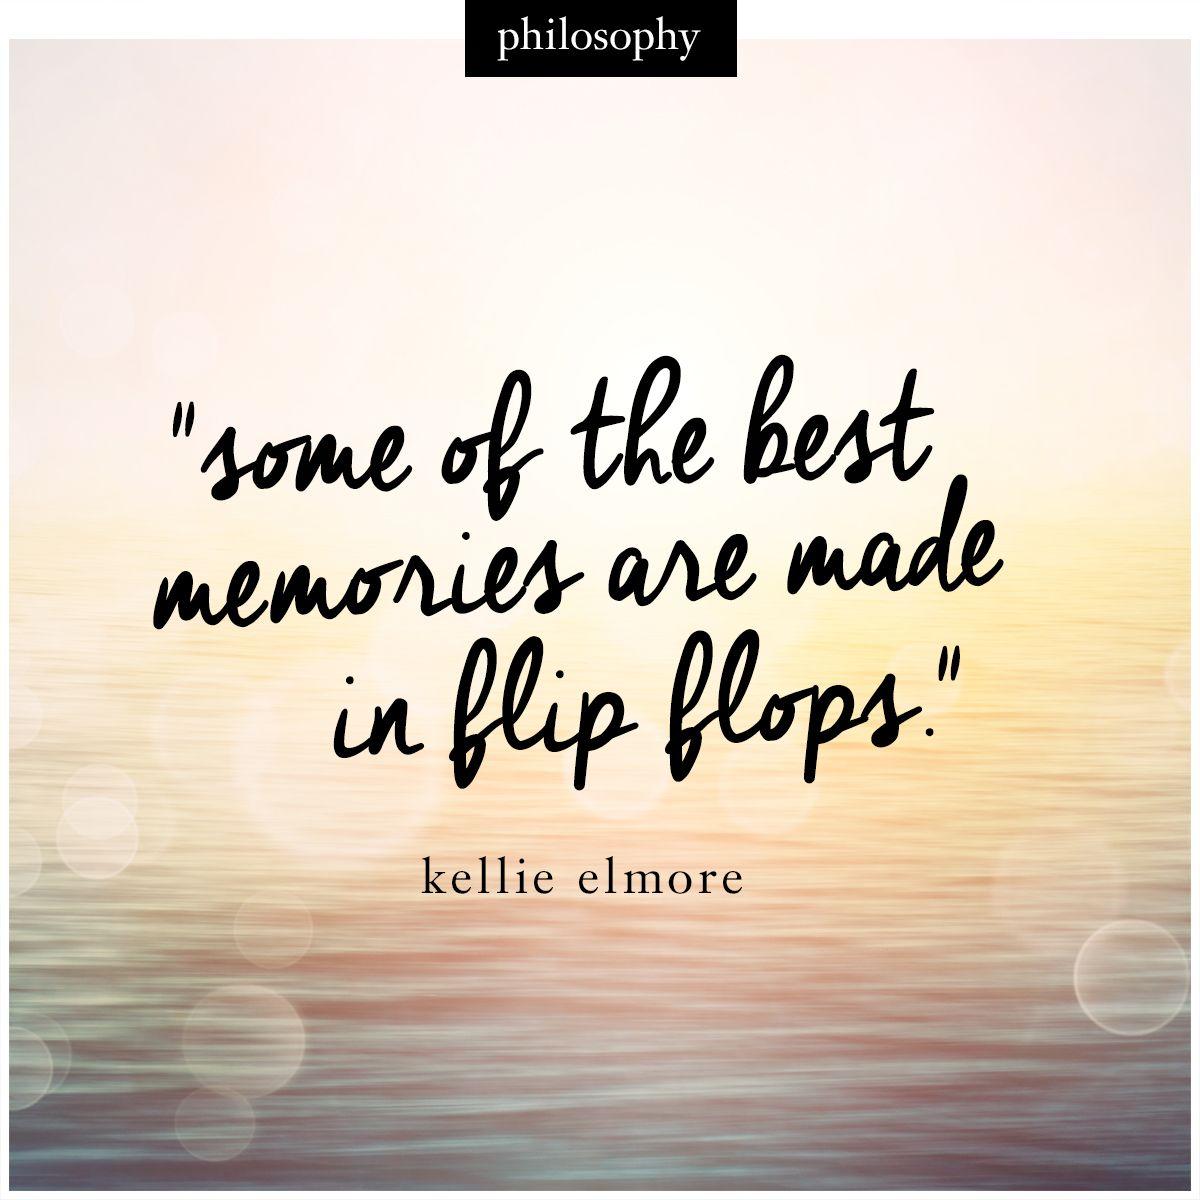 Make This The Best Summer Yet! #motivationmonday